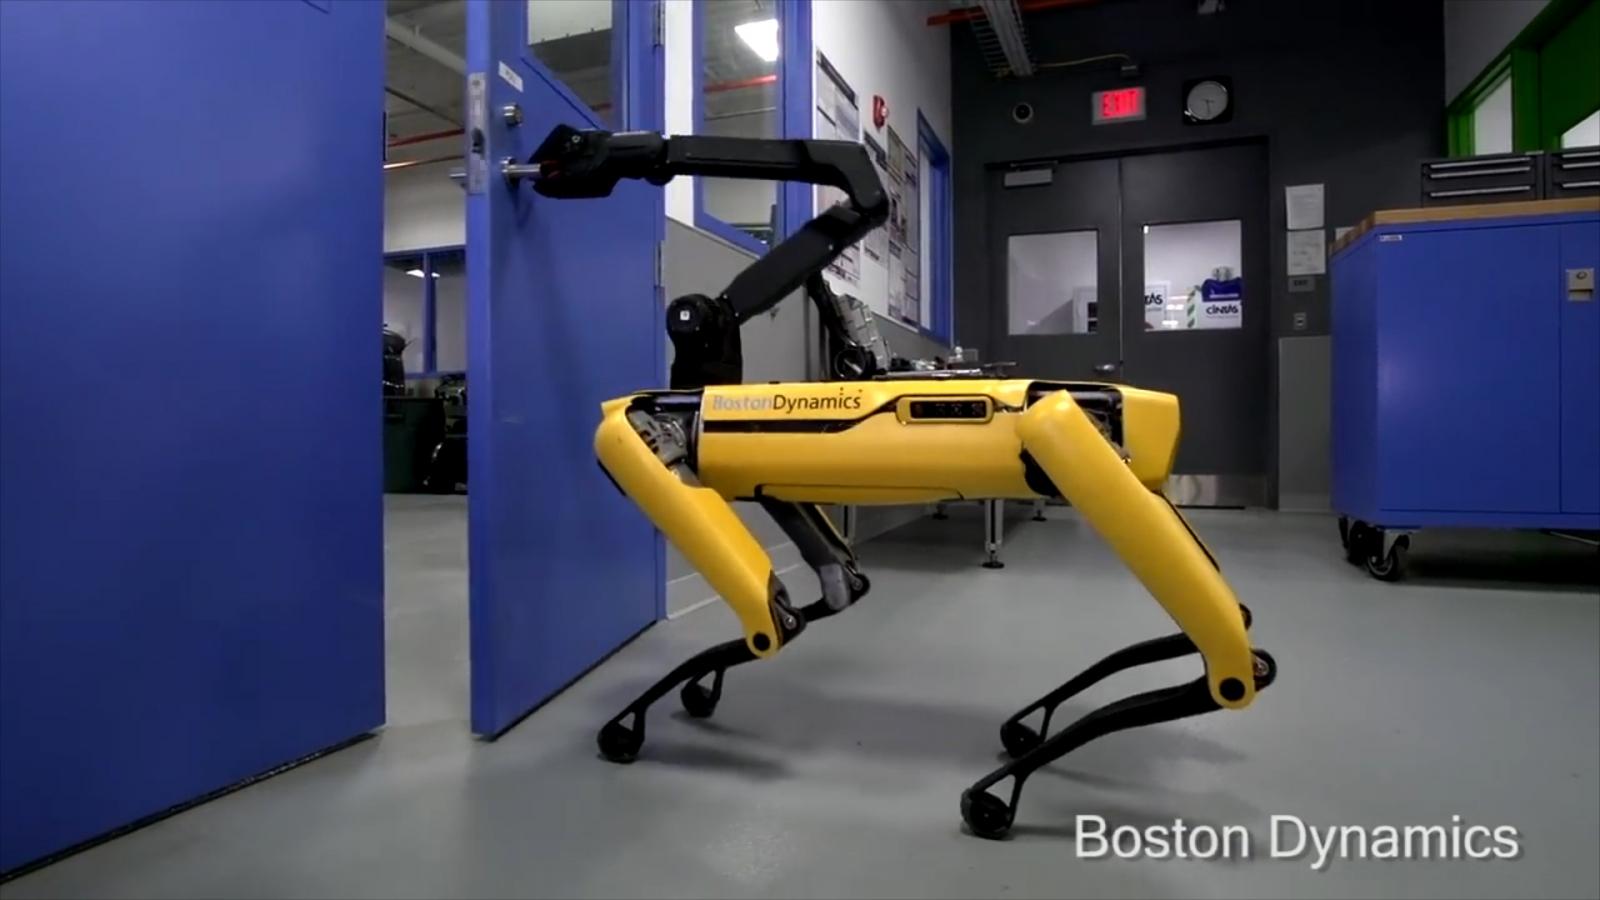 watch-boston-dynamics-new-robot-dog-open-doors